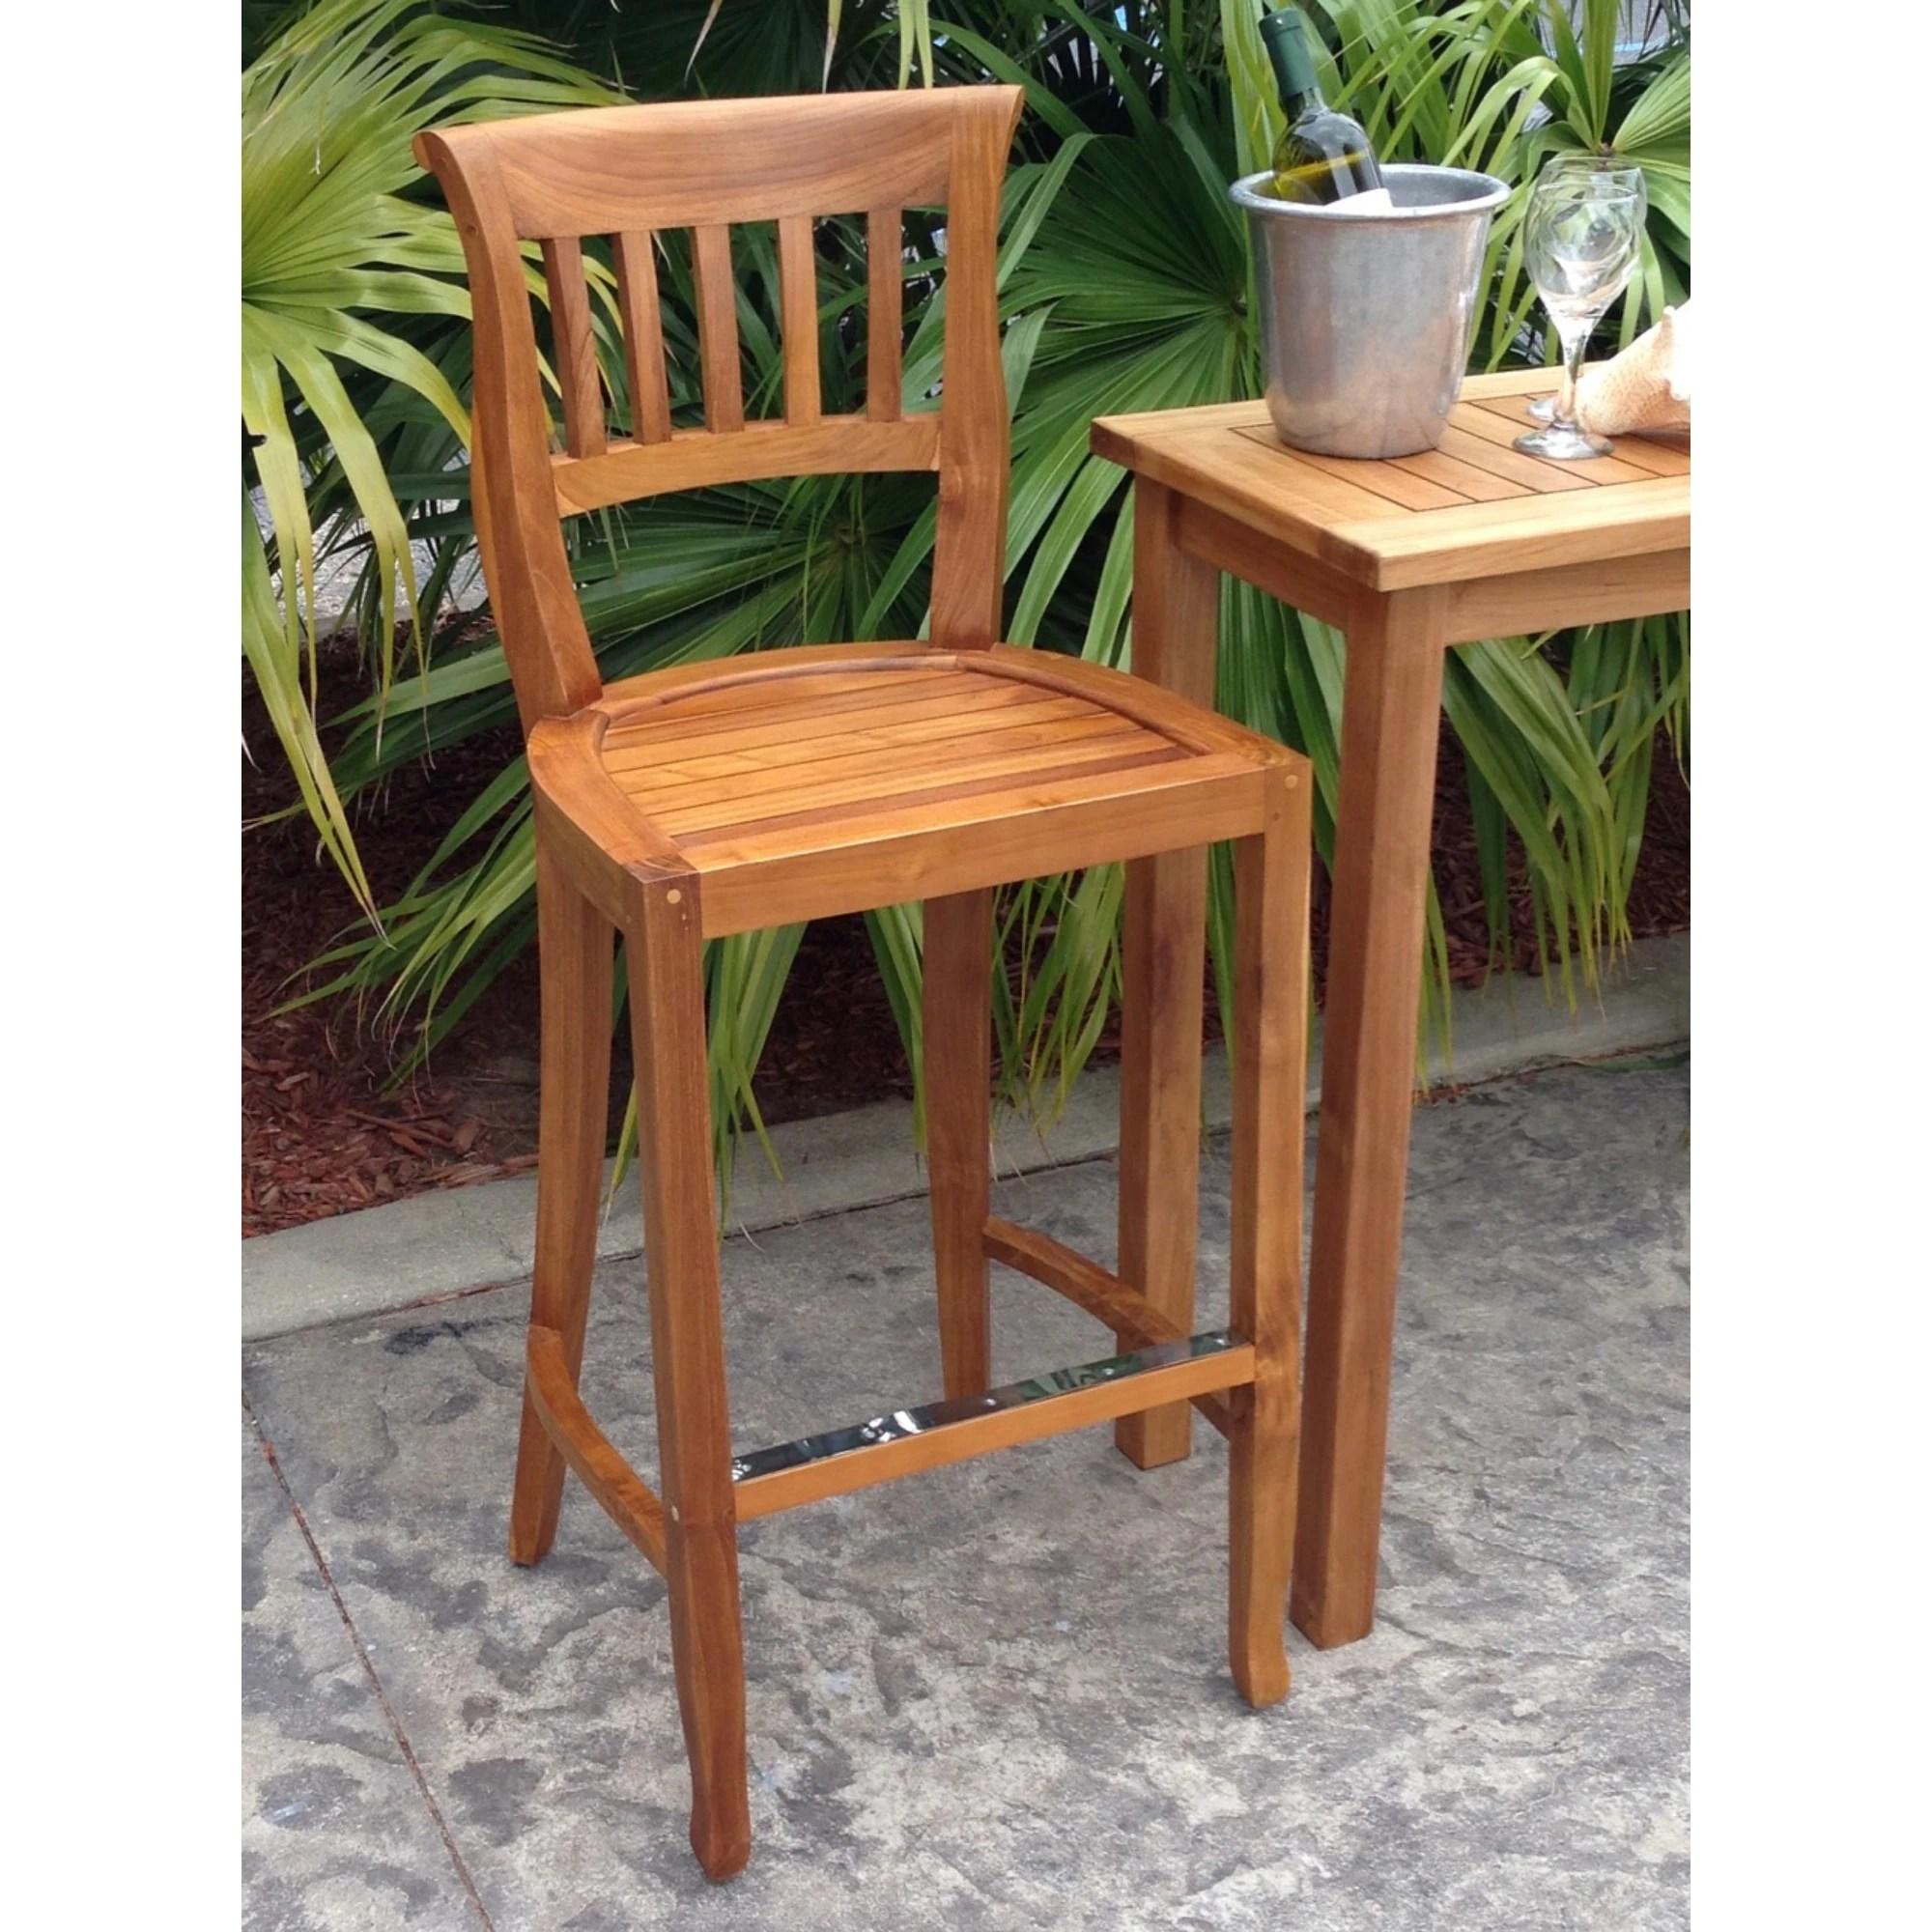 chic teak amsterdam teak wood indoor outdoor bar stool chair